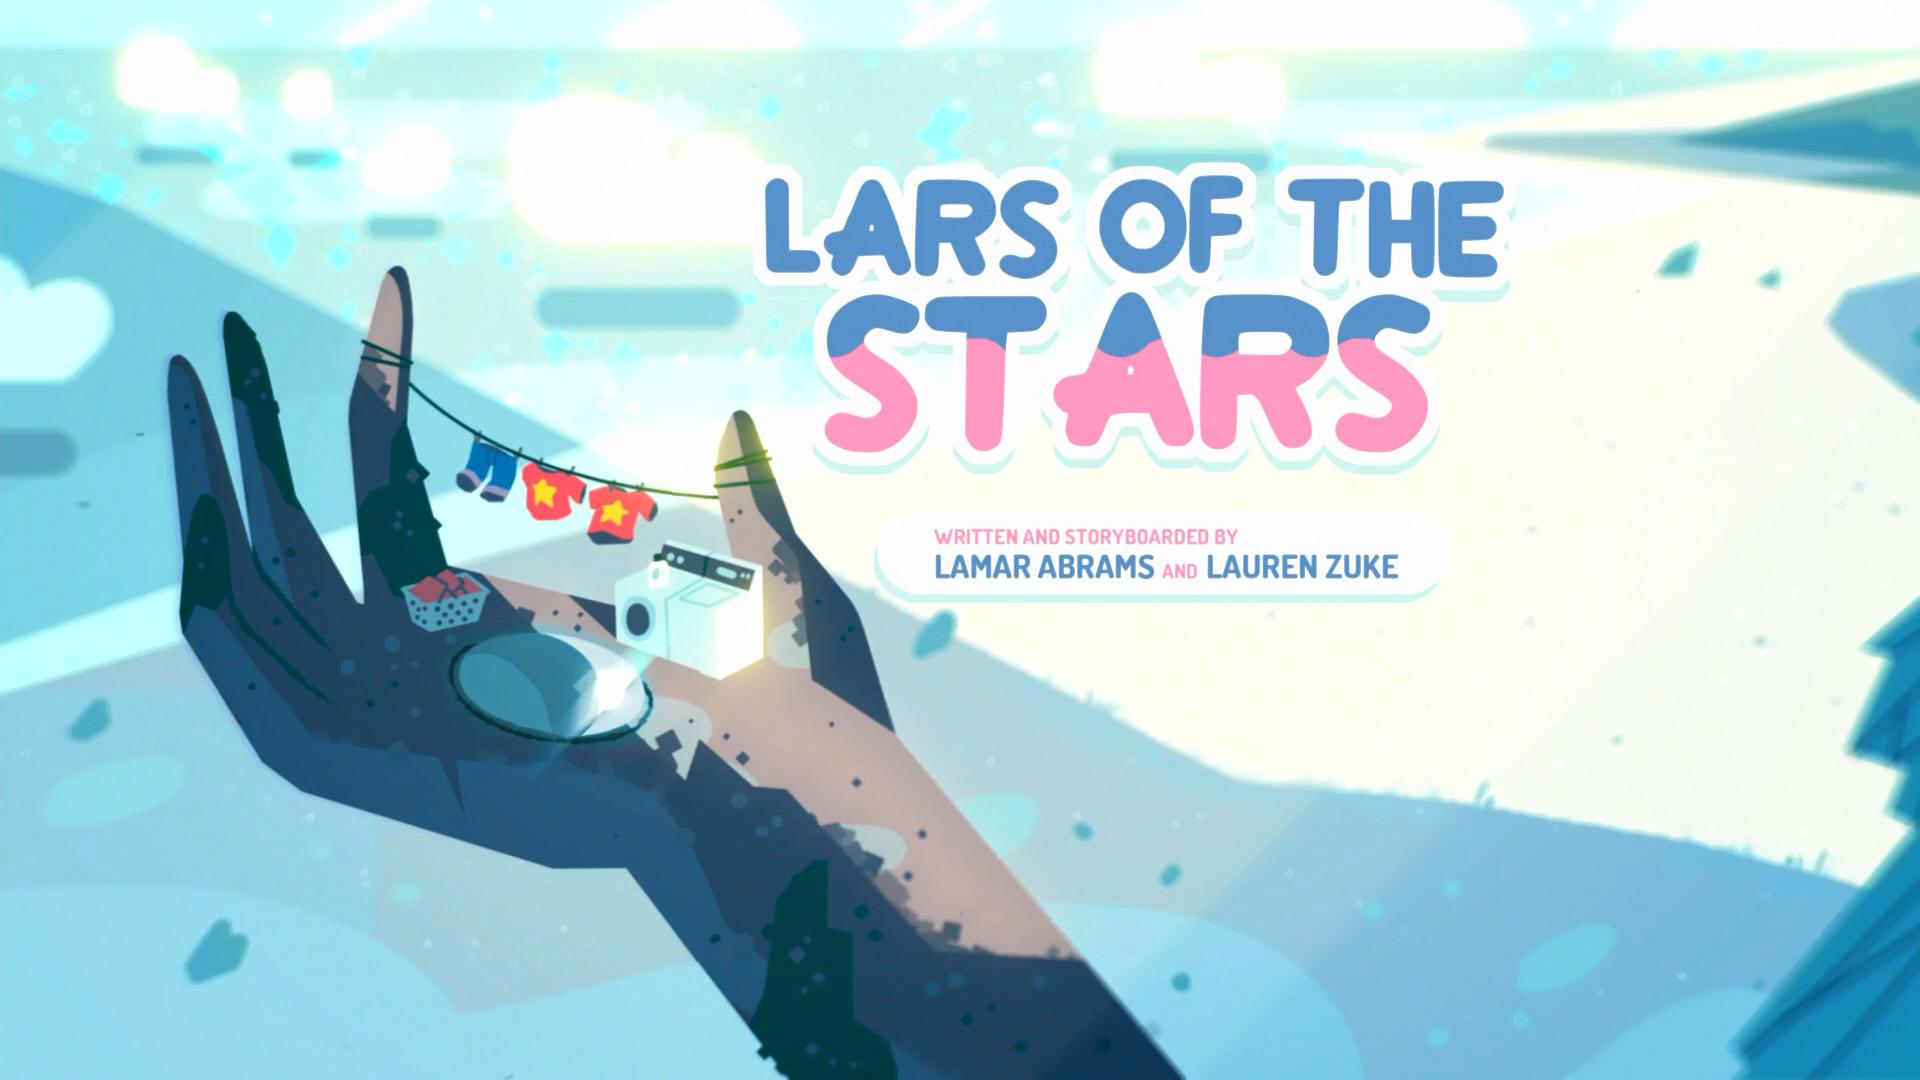 Lars of the Stars/Gallery